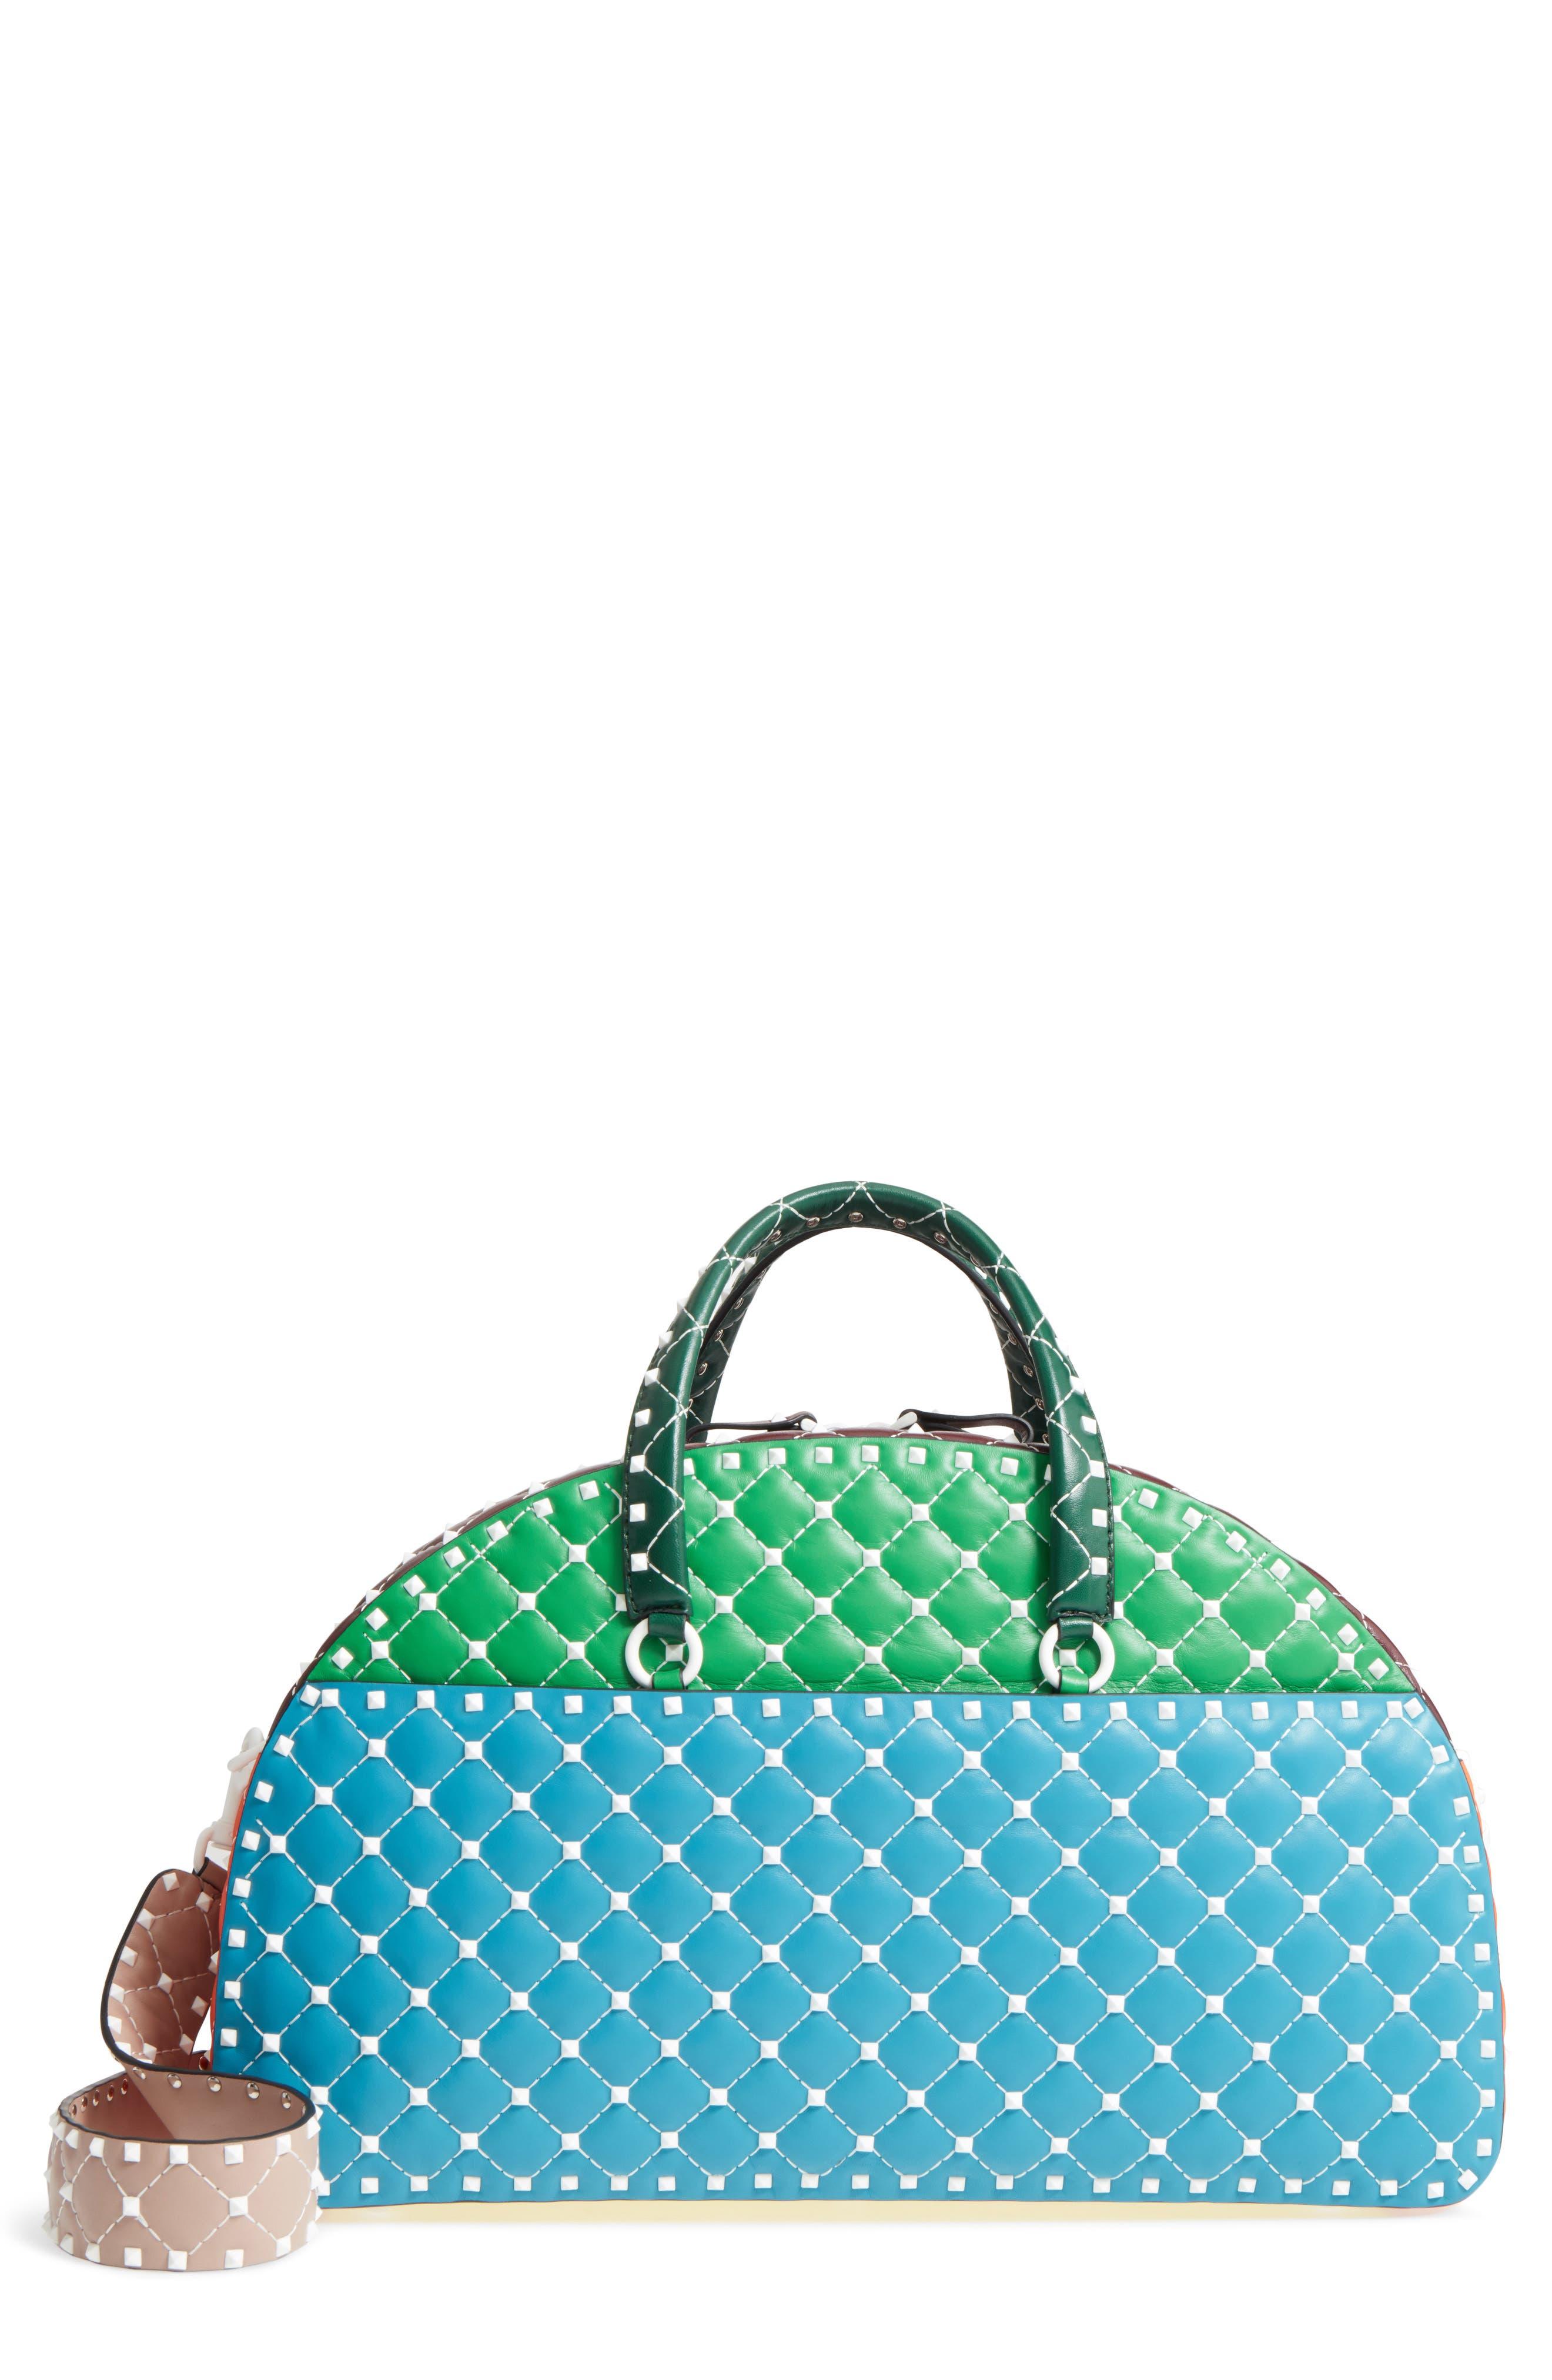 VALENTINO GARAVANI Rockstud Leather Bowling Bag